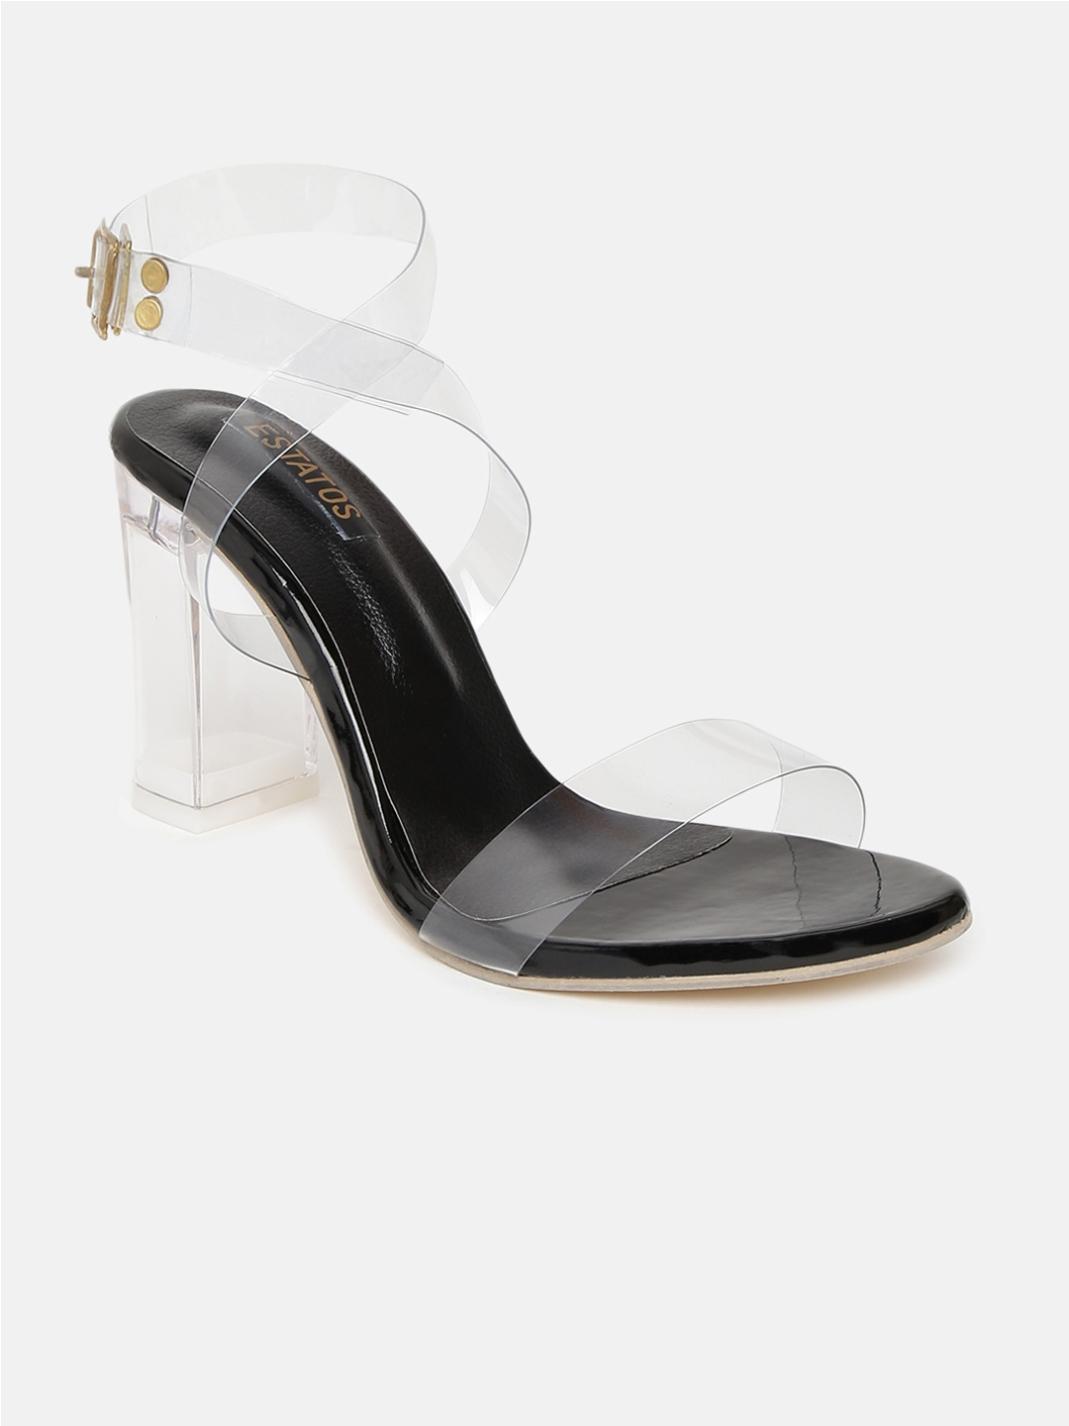 ESTATOS | Estatos Leather Single Strap Block High Heeled White Sandals